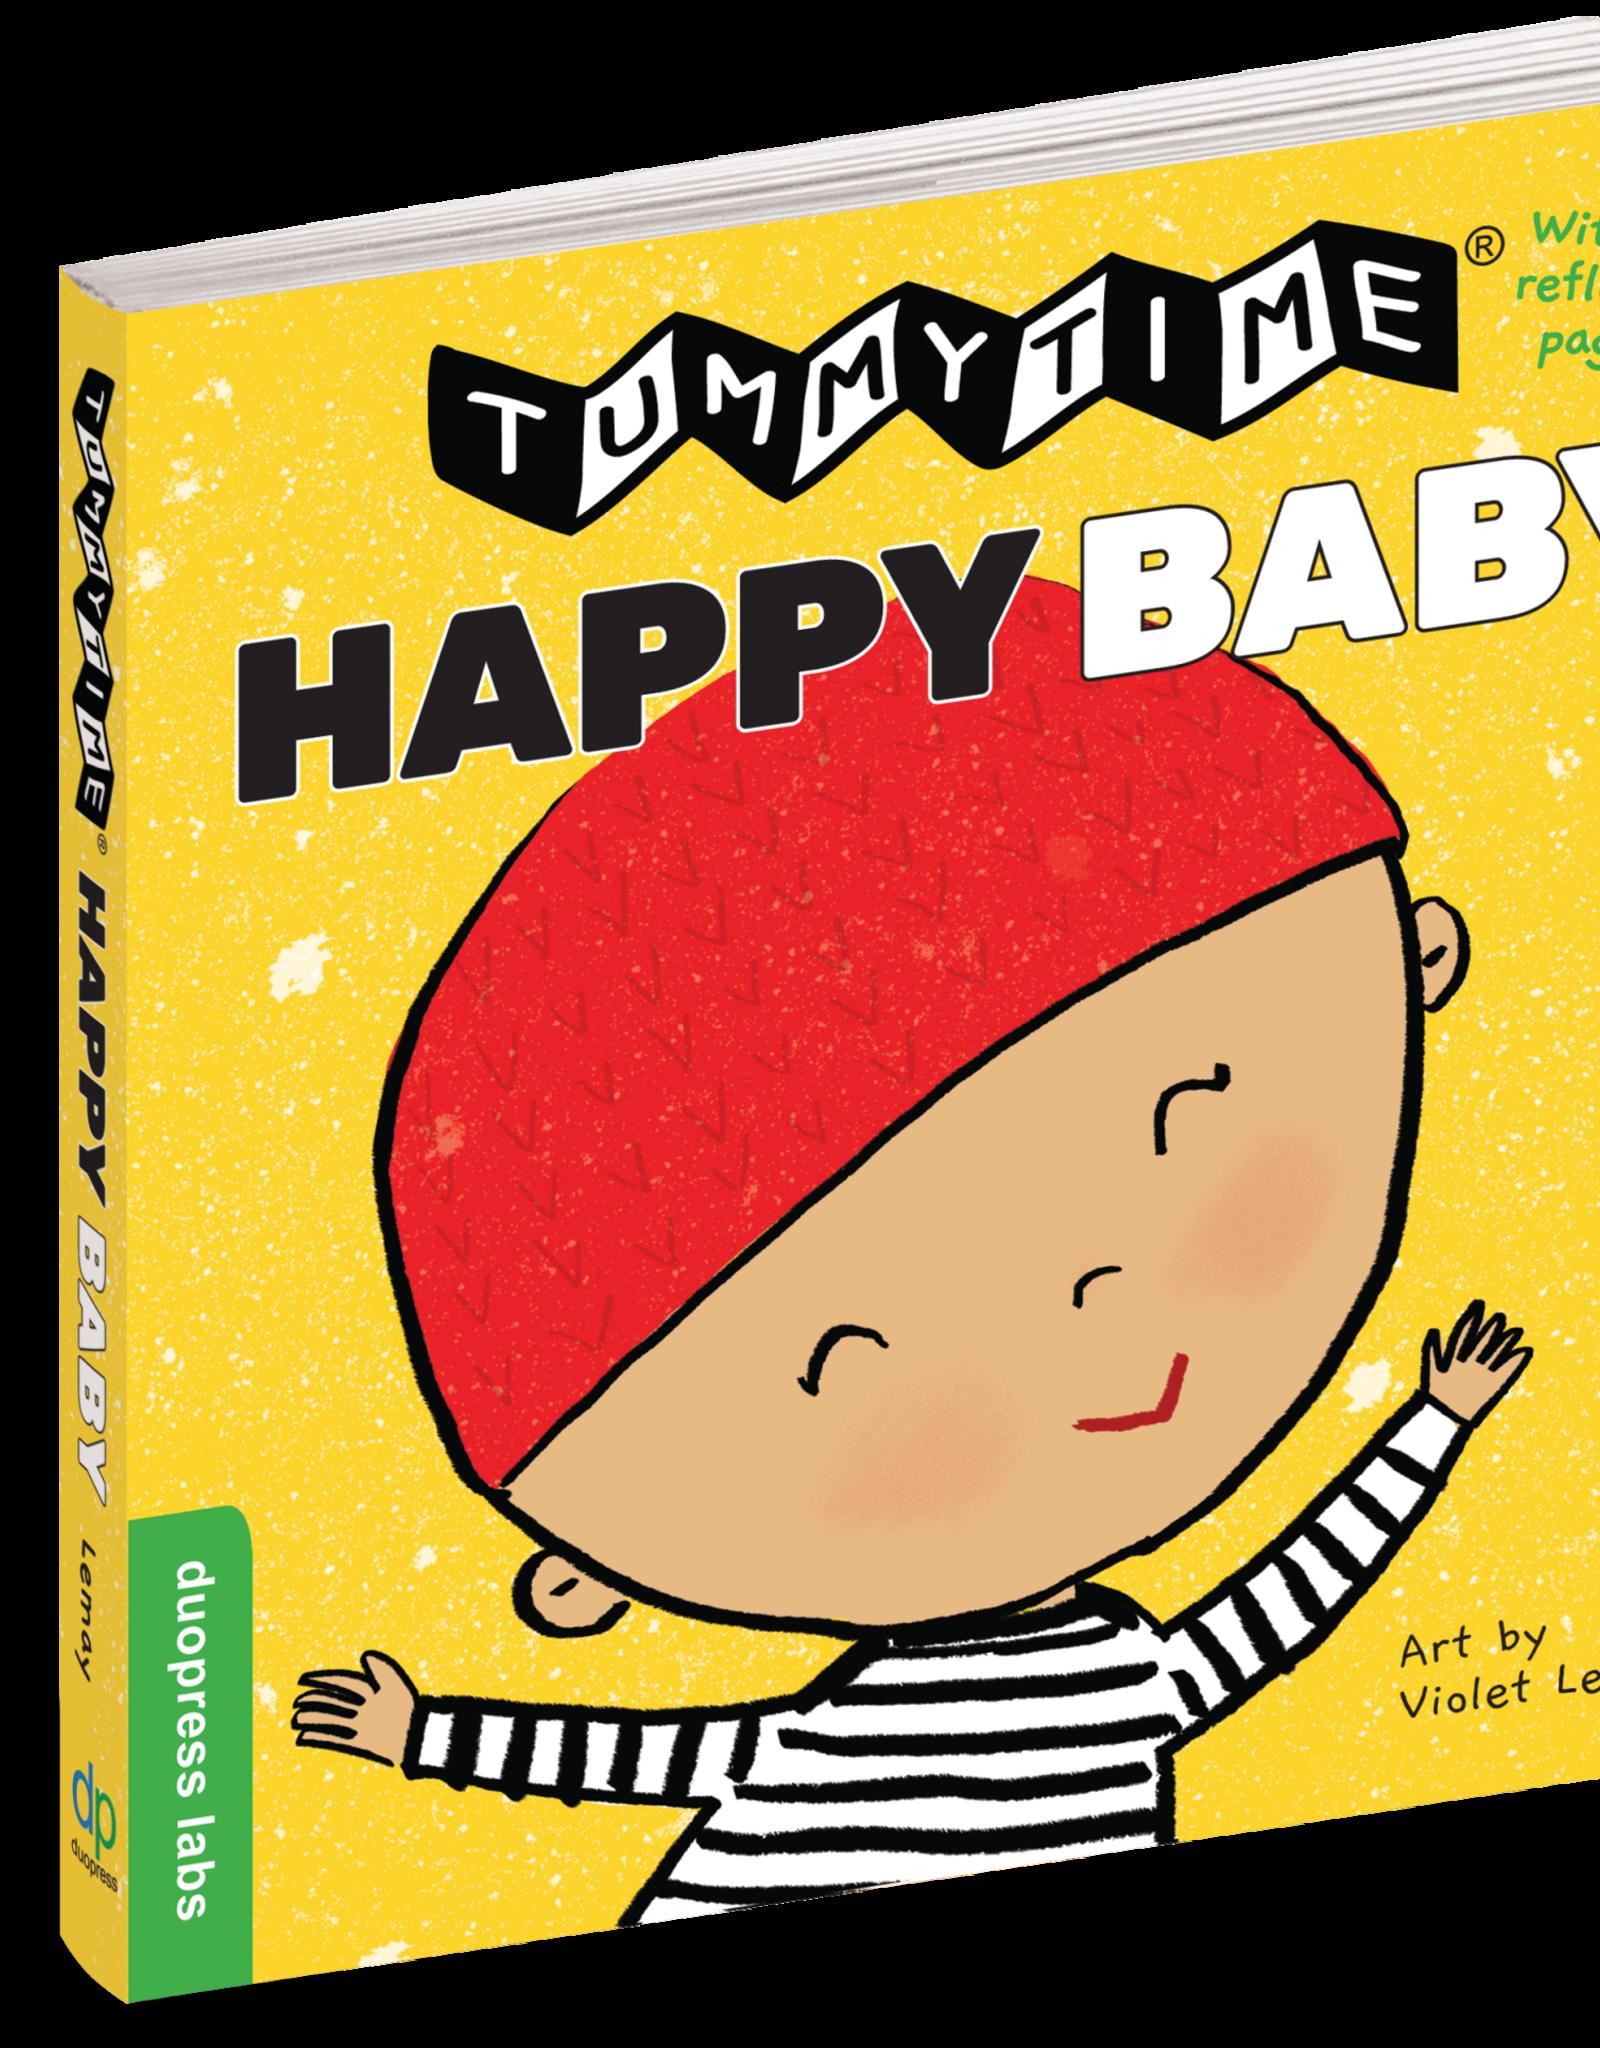 Workman Tummy Time Happy Baby